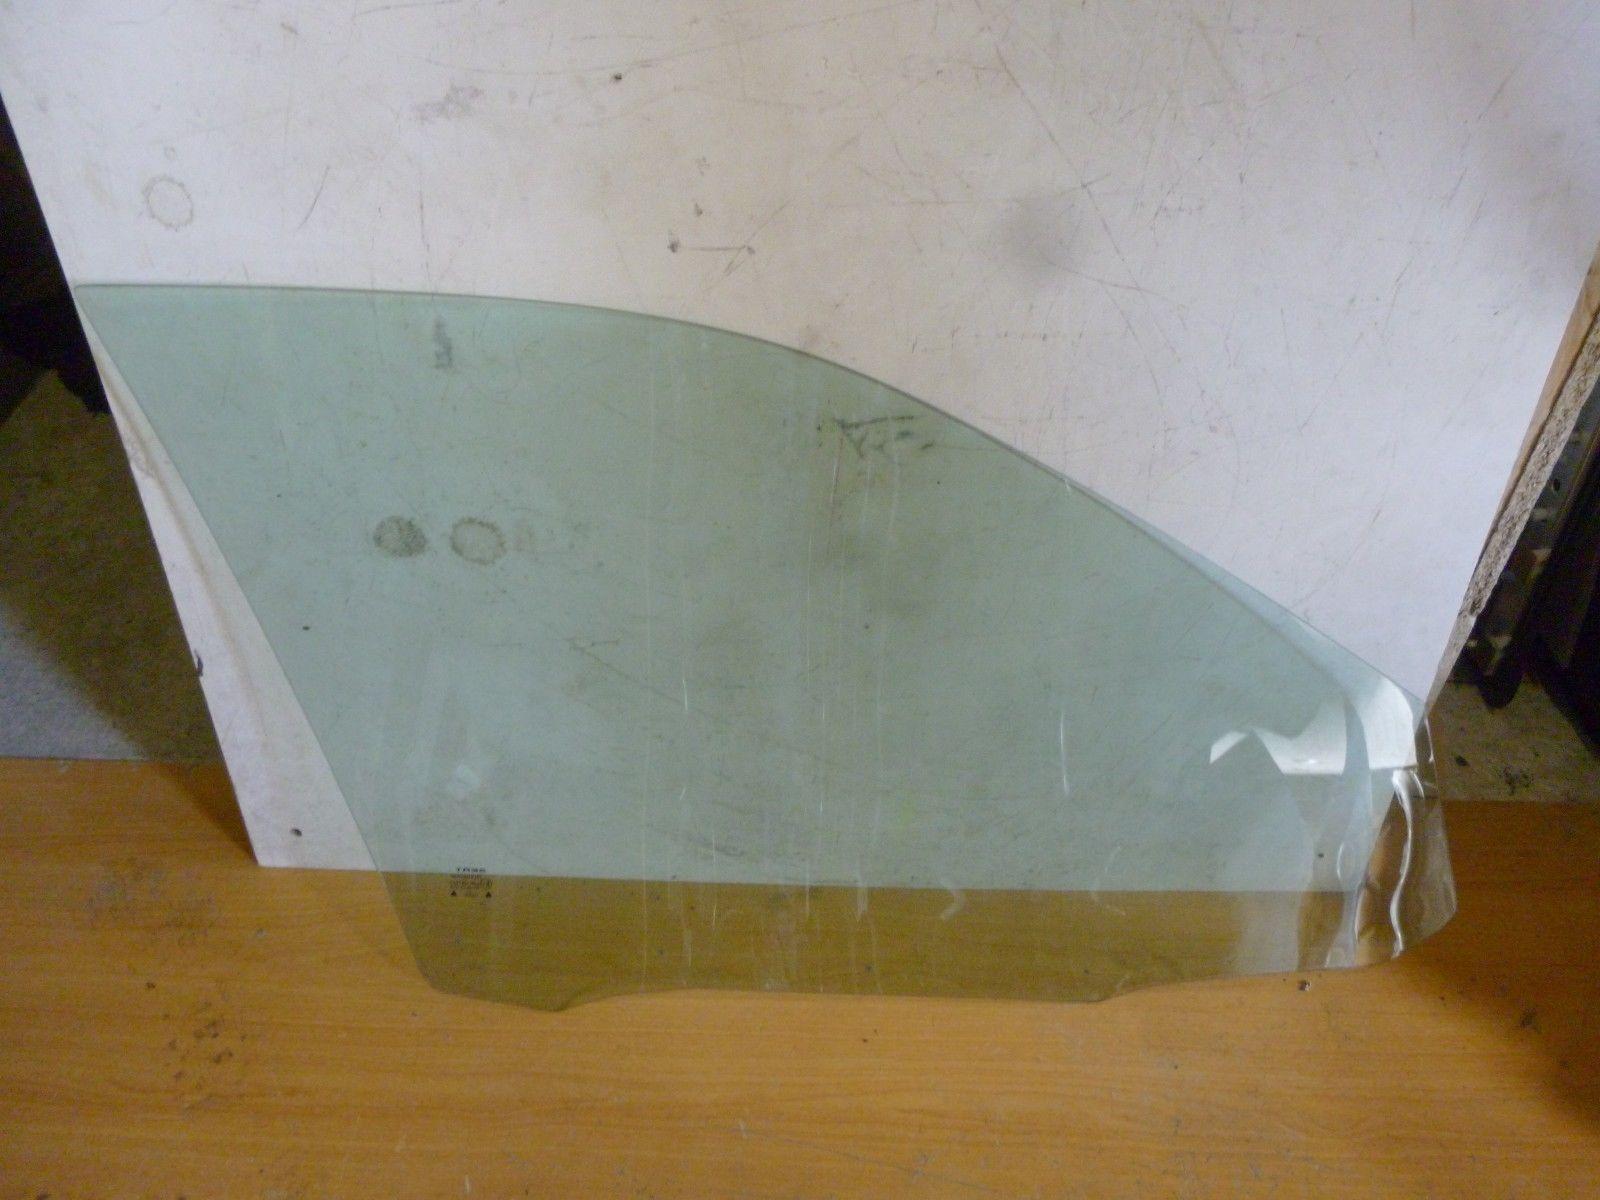 SEAT LEON Türscheibe 5 tür links - 43R-007022 - Bj 2000